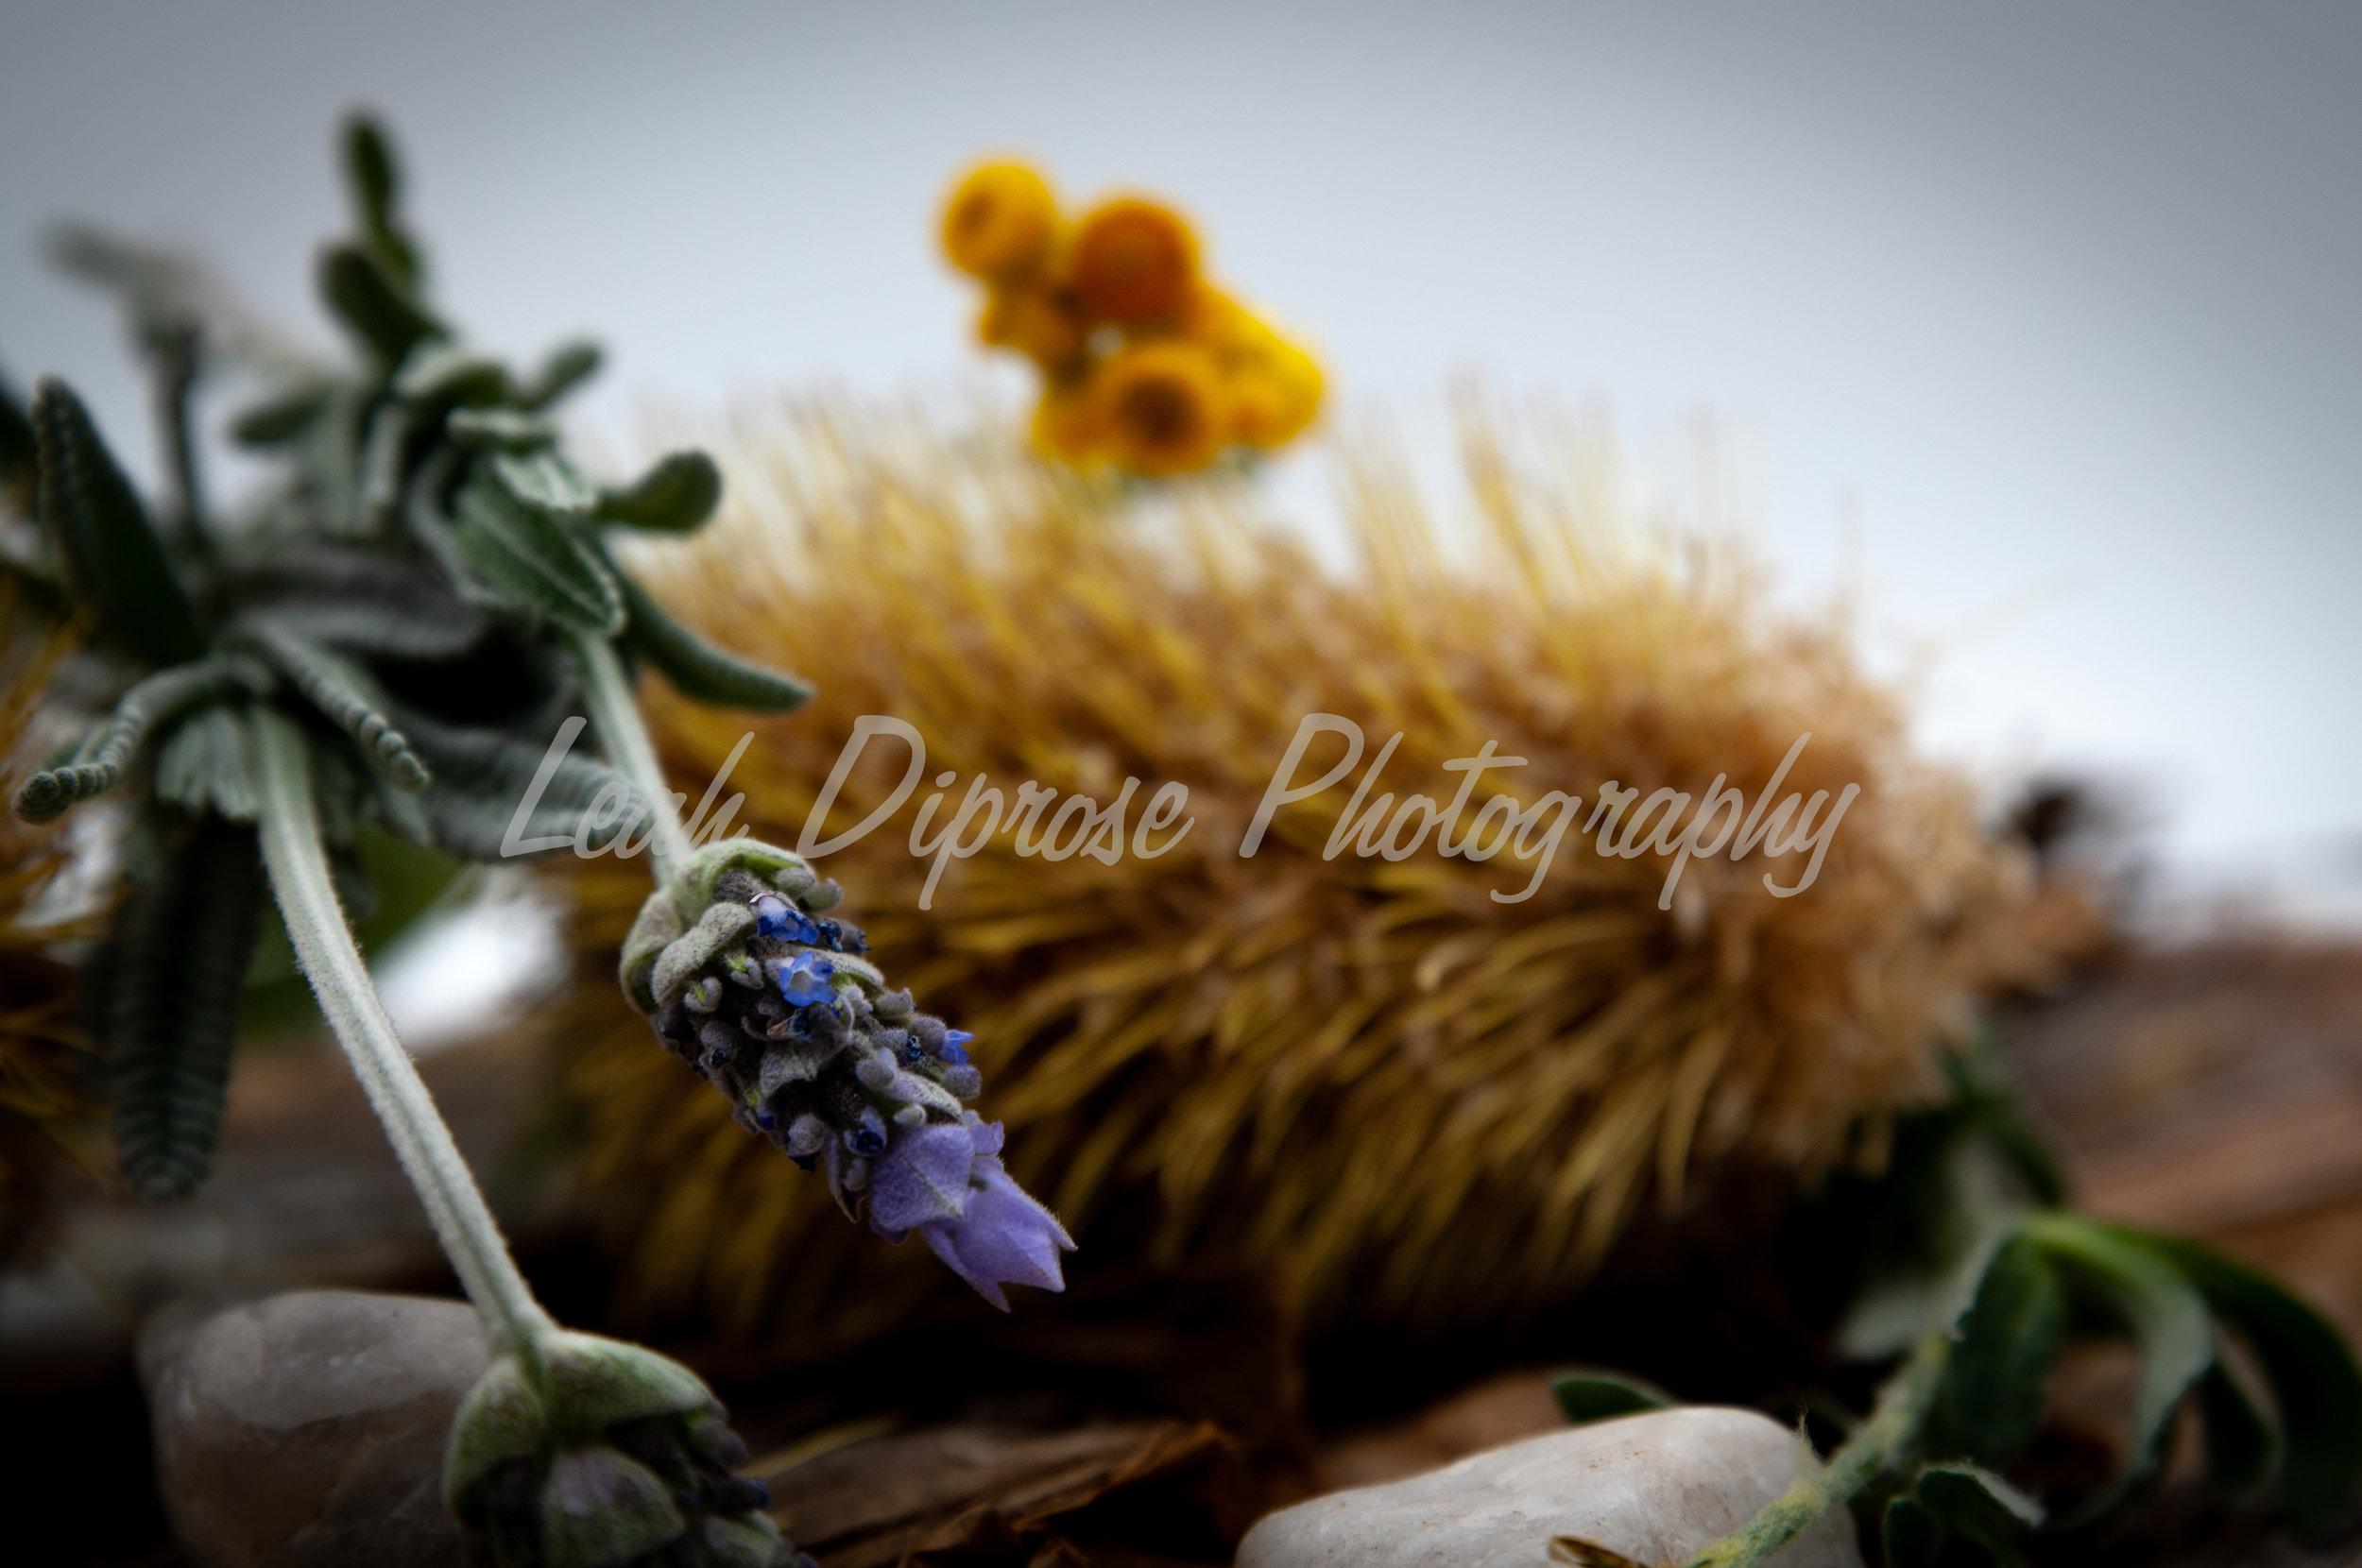 Leah Diprose Photography image-1591.jpg